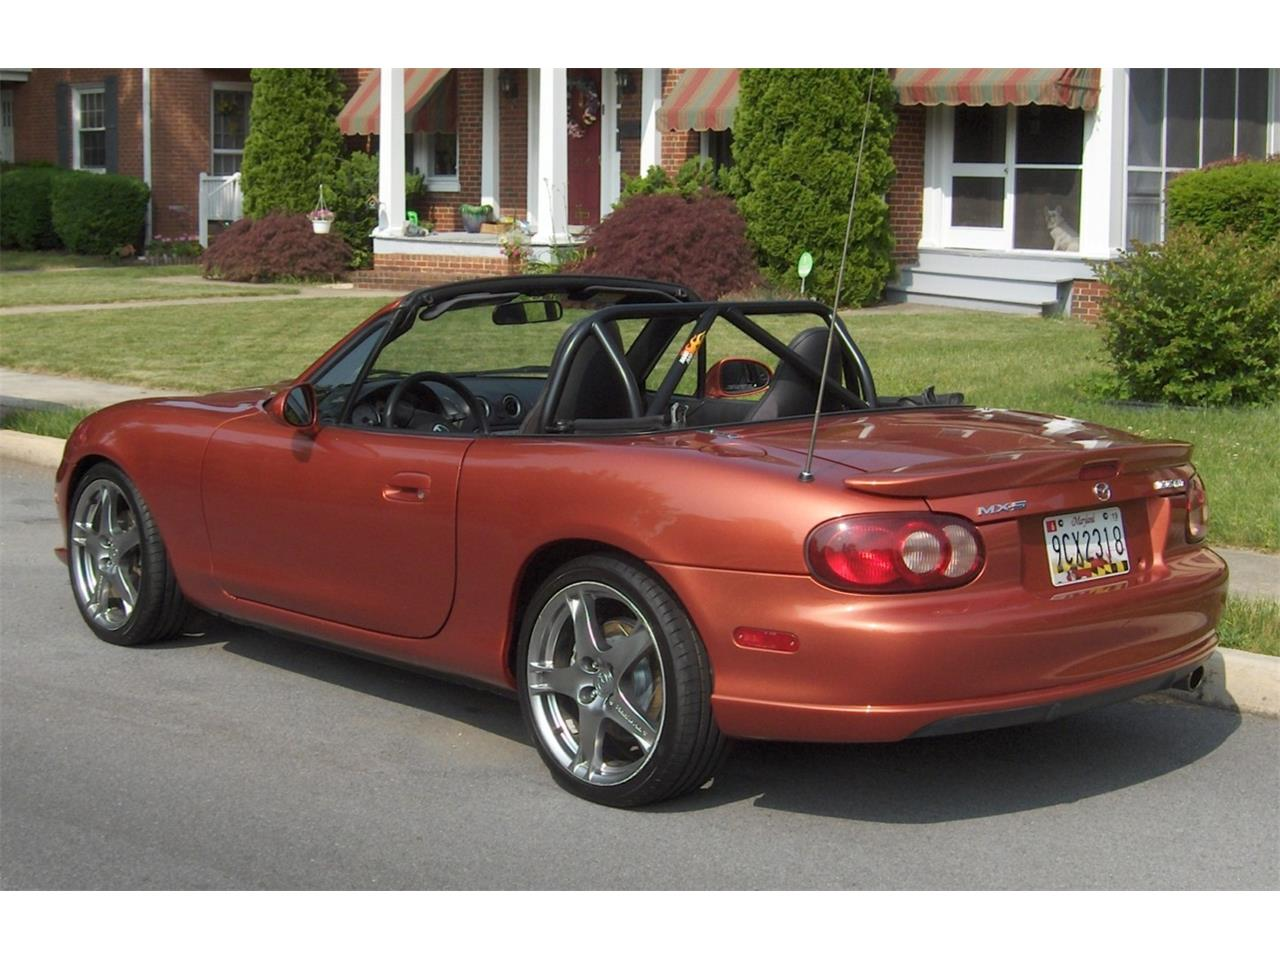 2005 Mazda Miata for Sale | ClassicCars com | CC-1240643